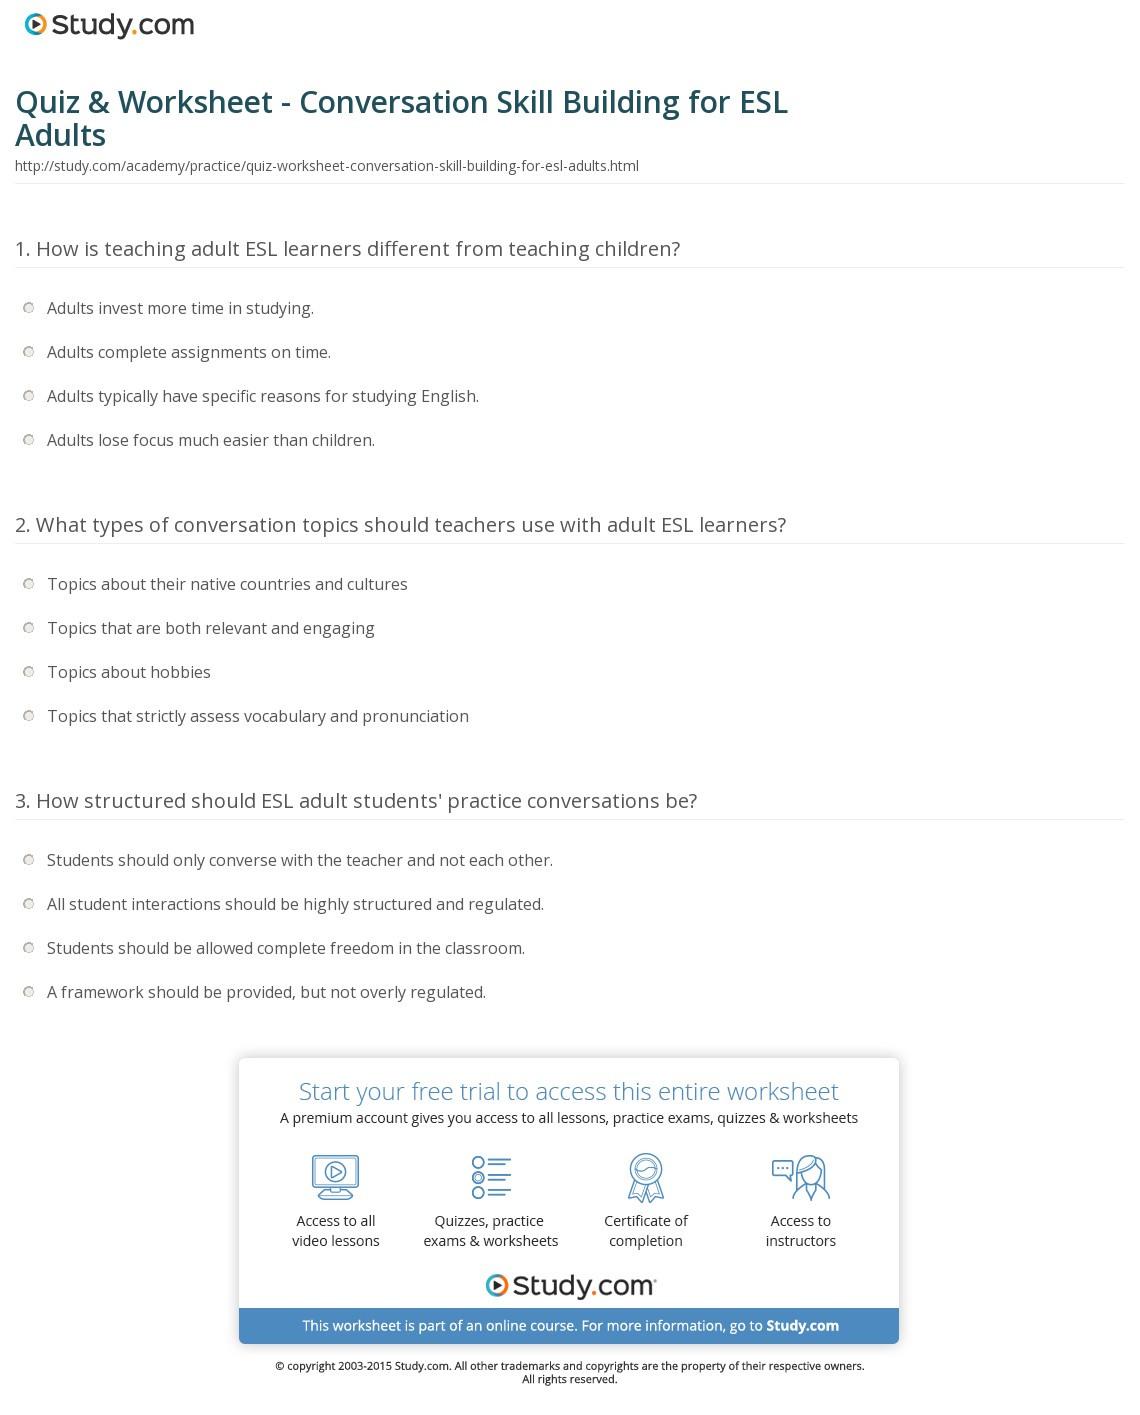 Quiz Worksheet Conversation Skill Building For Esl